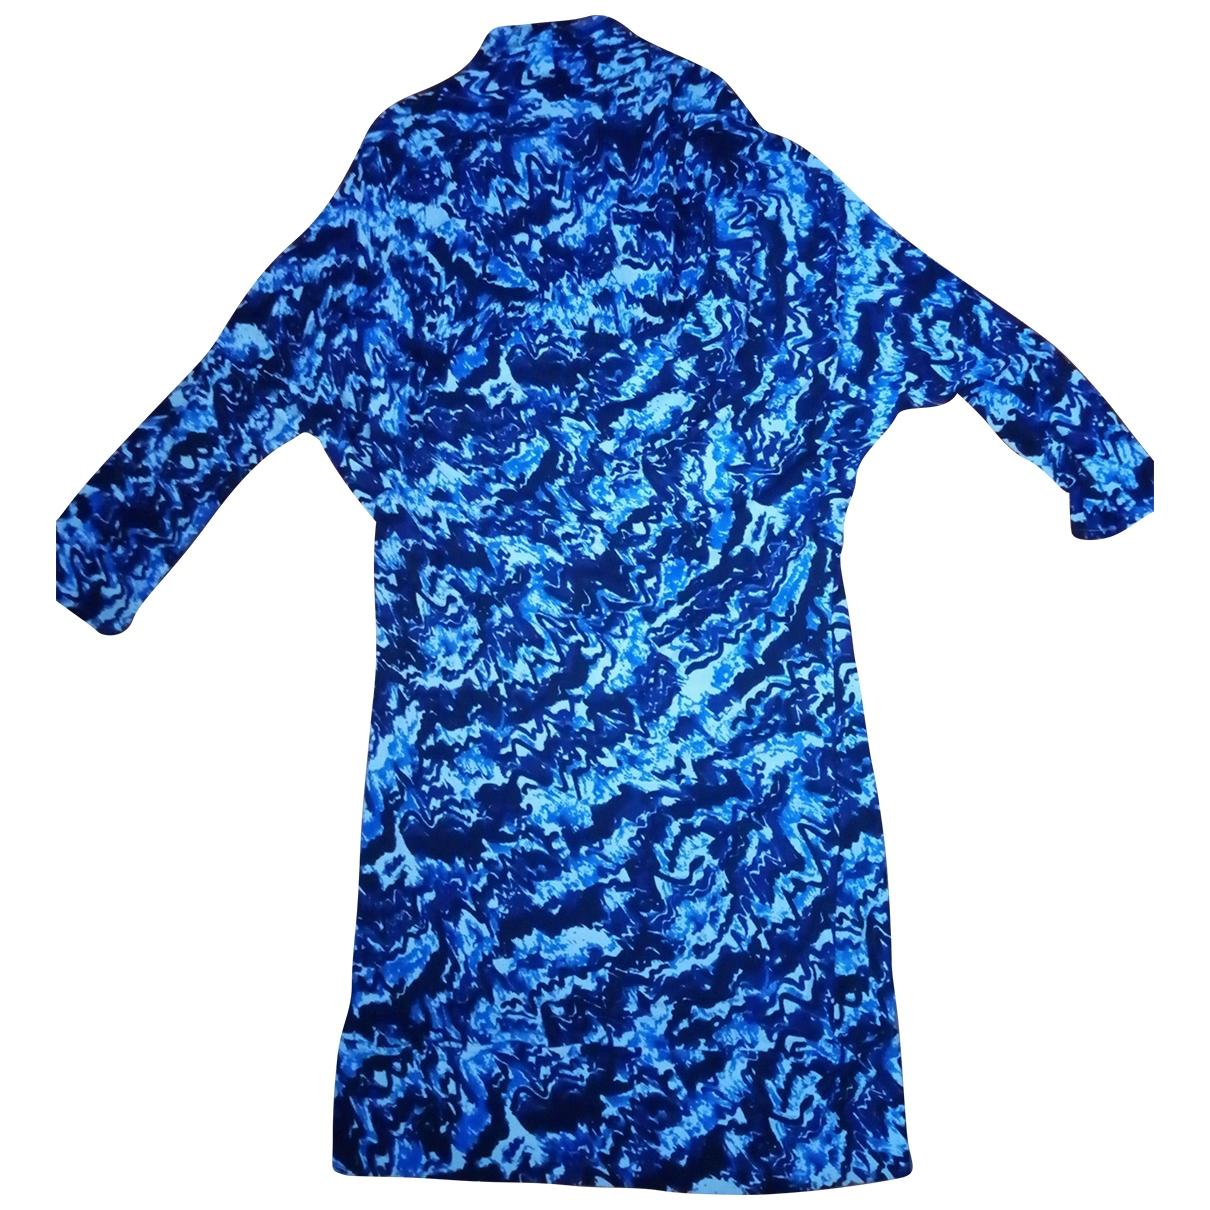 Balenciaga \N Blue dress for Women 36 FR